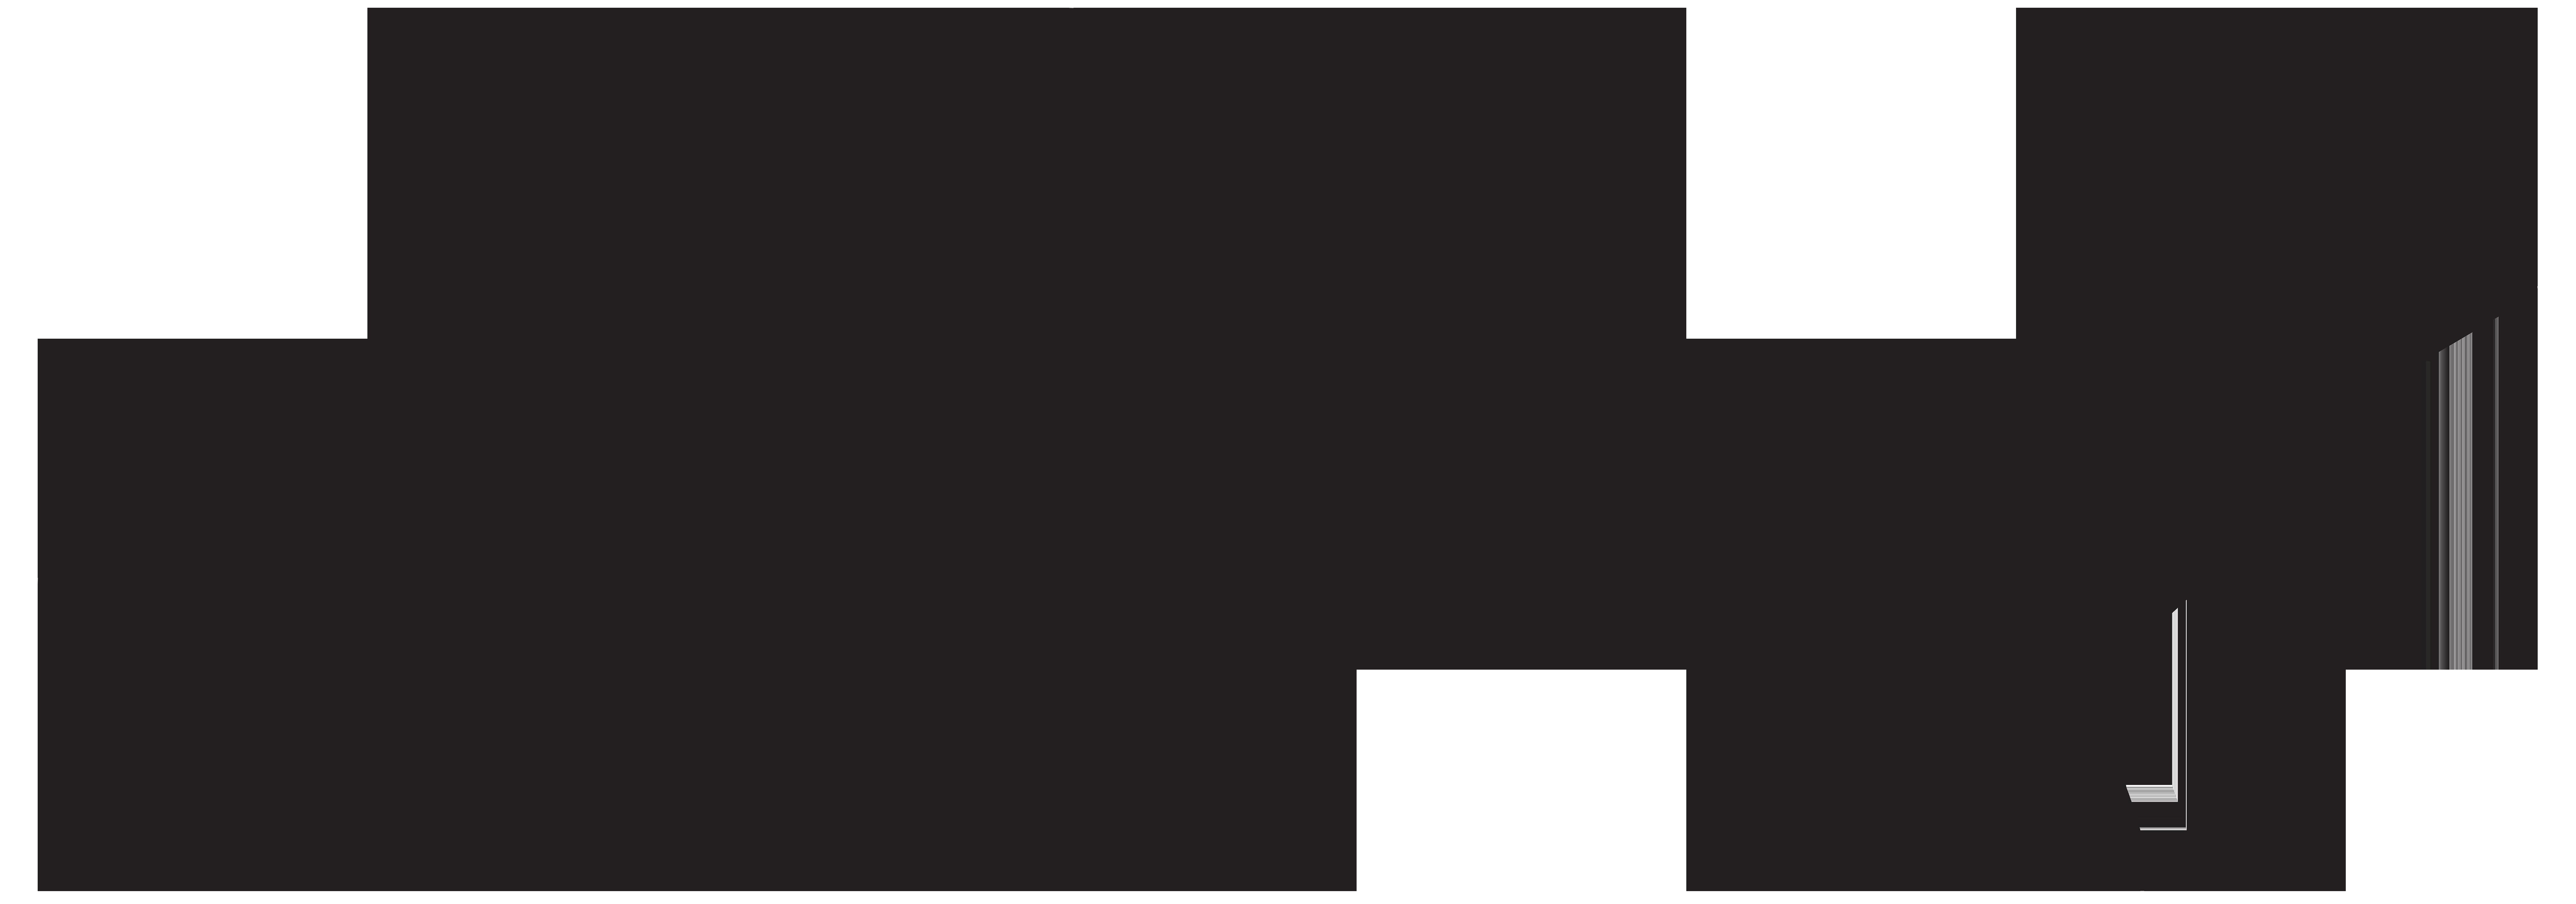 Free clip art silhouette. Clipart shark nice shark